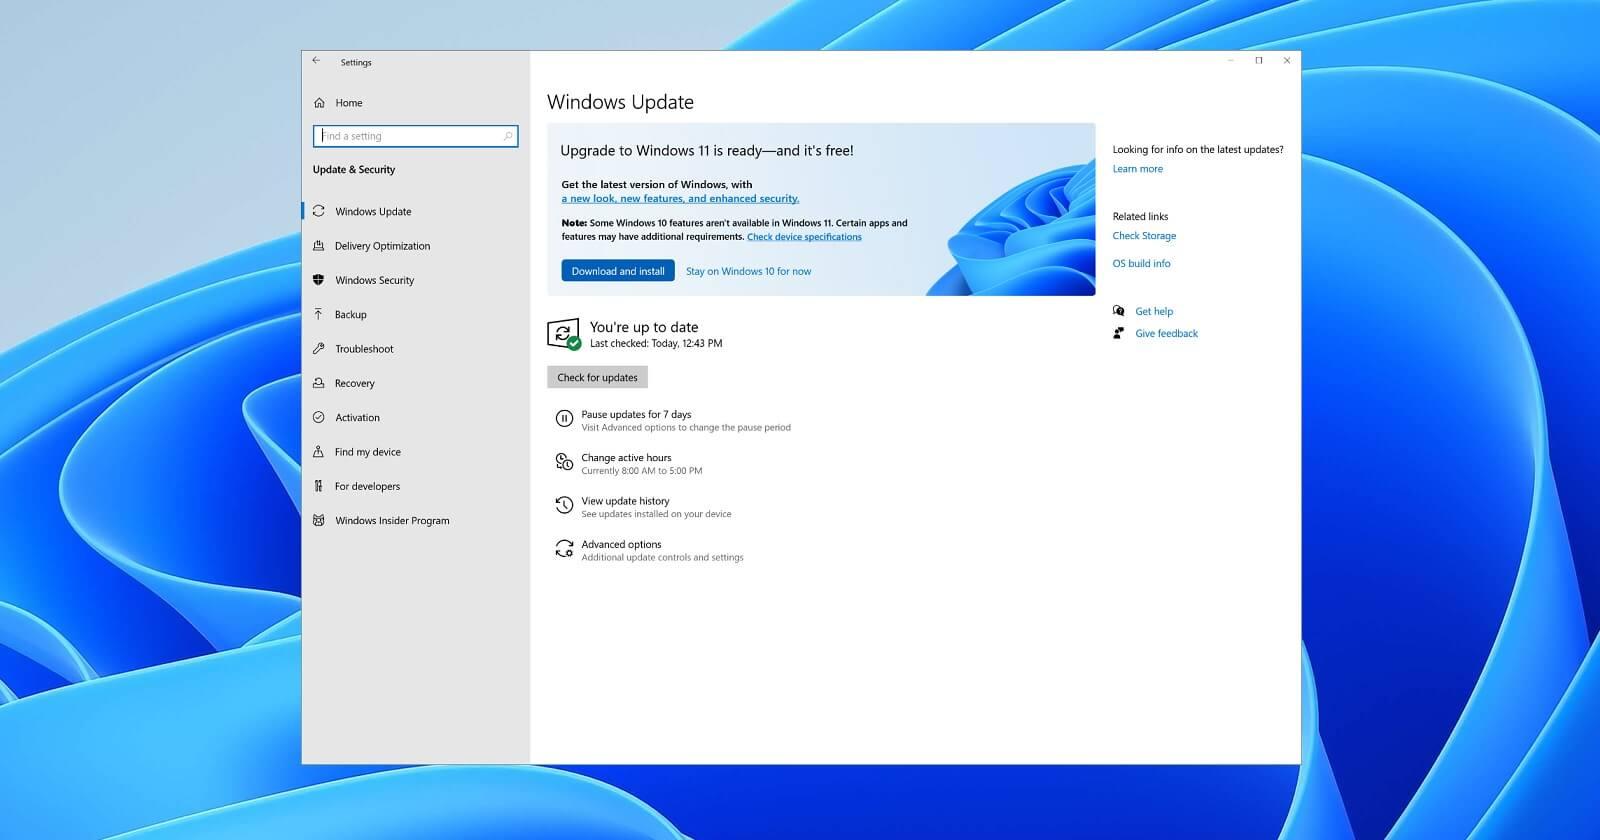 www.windowslatest.com